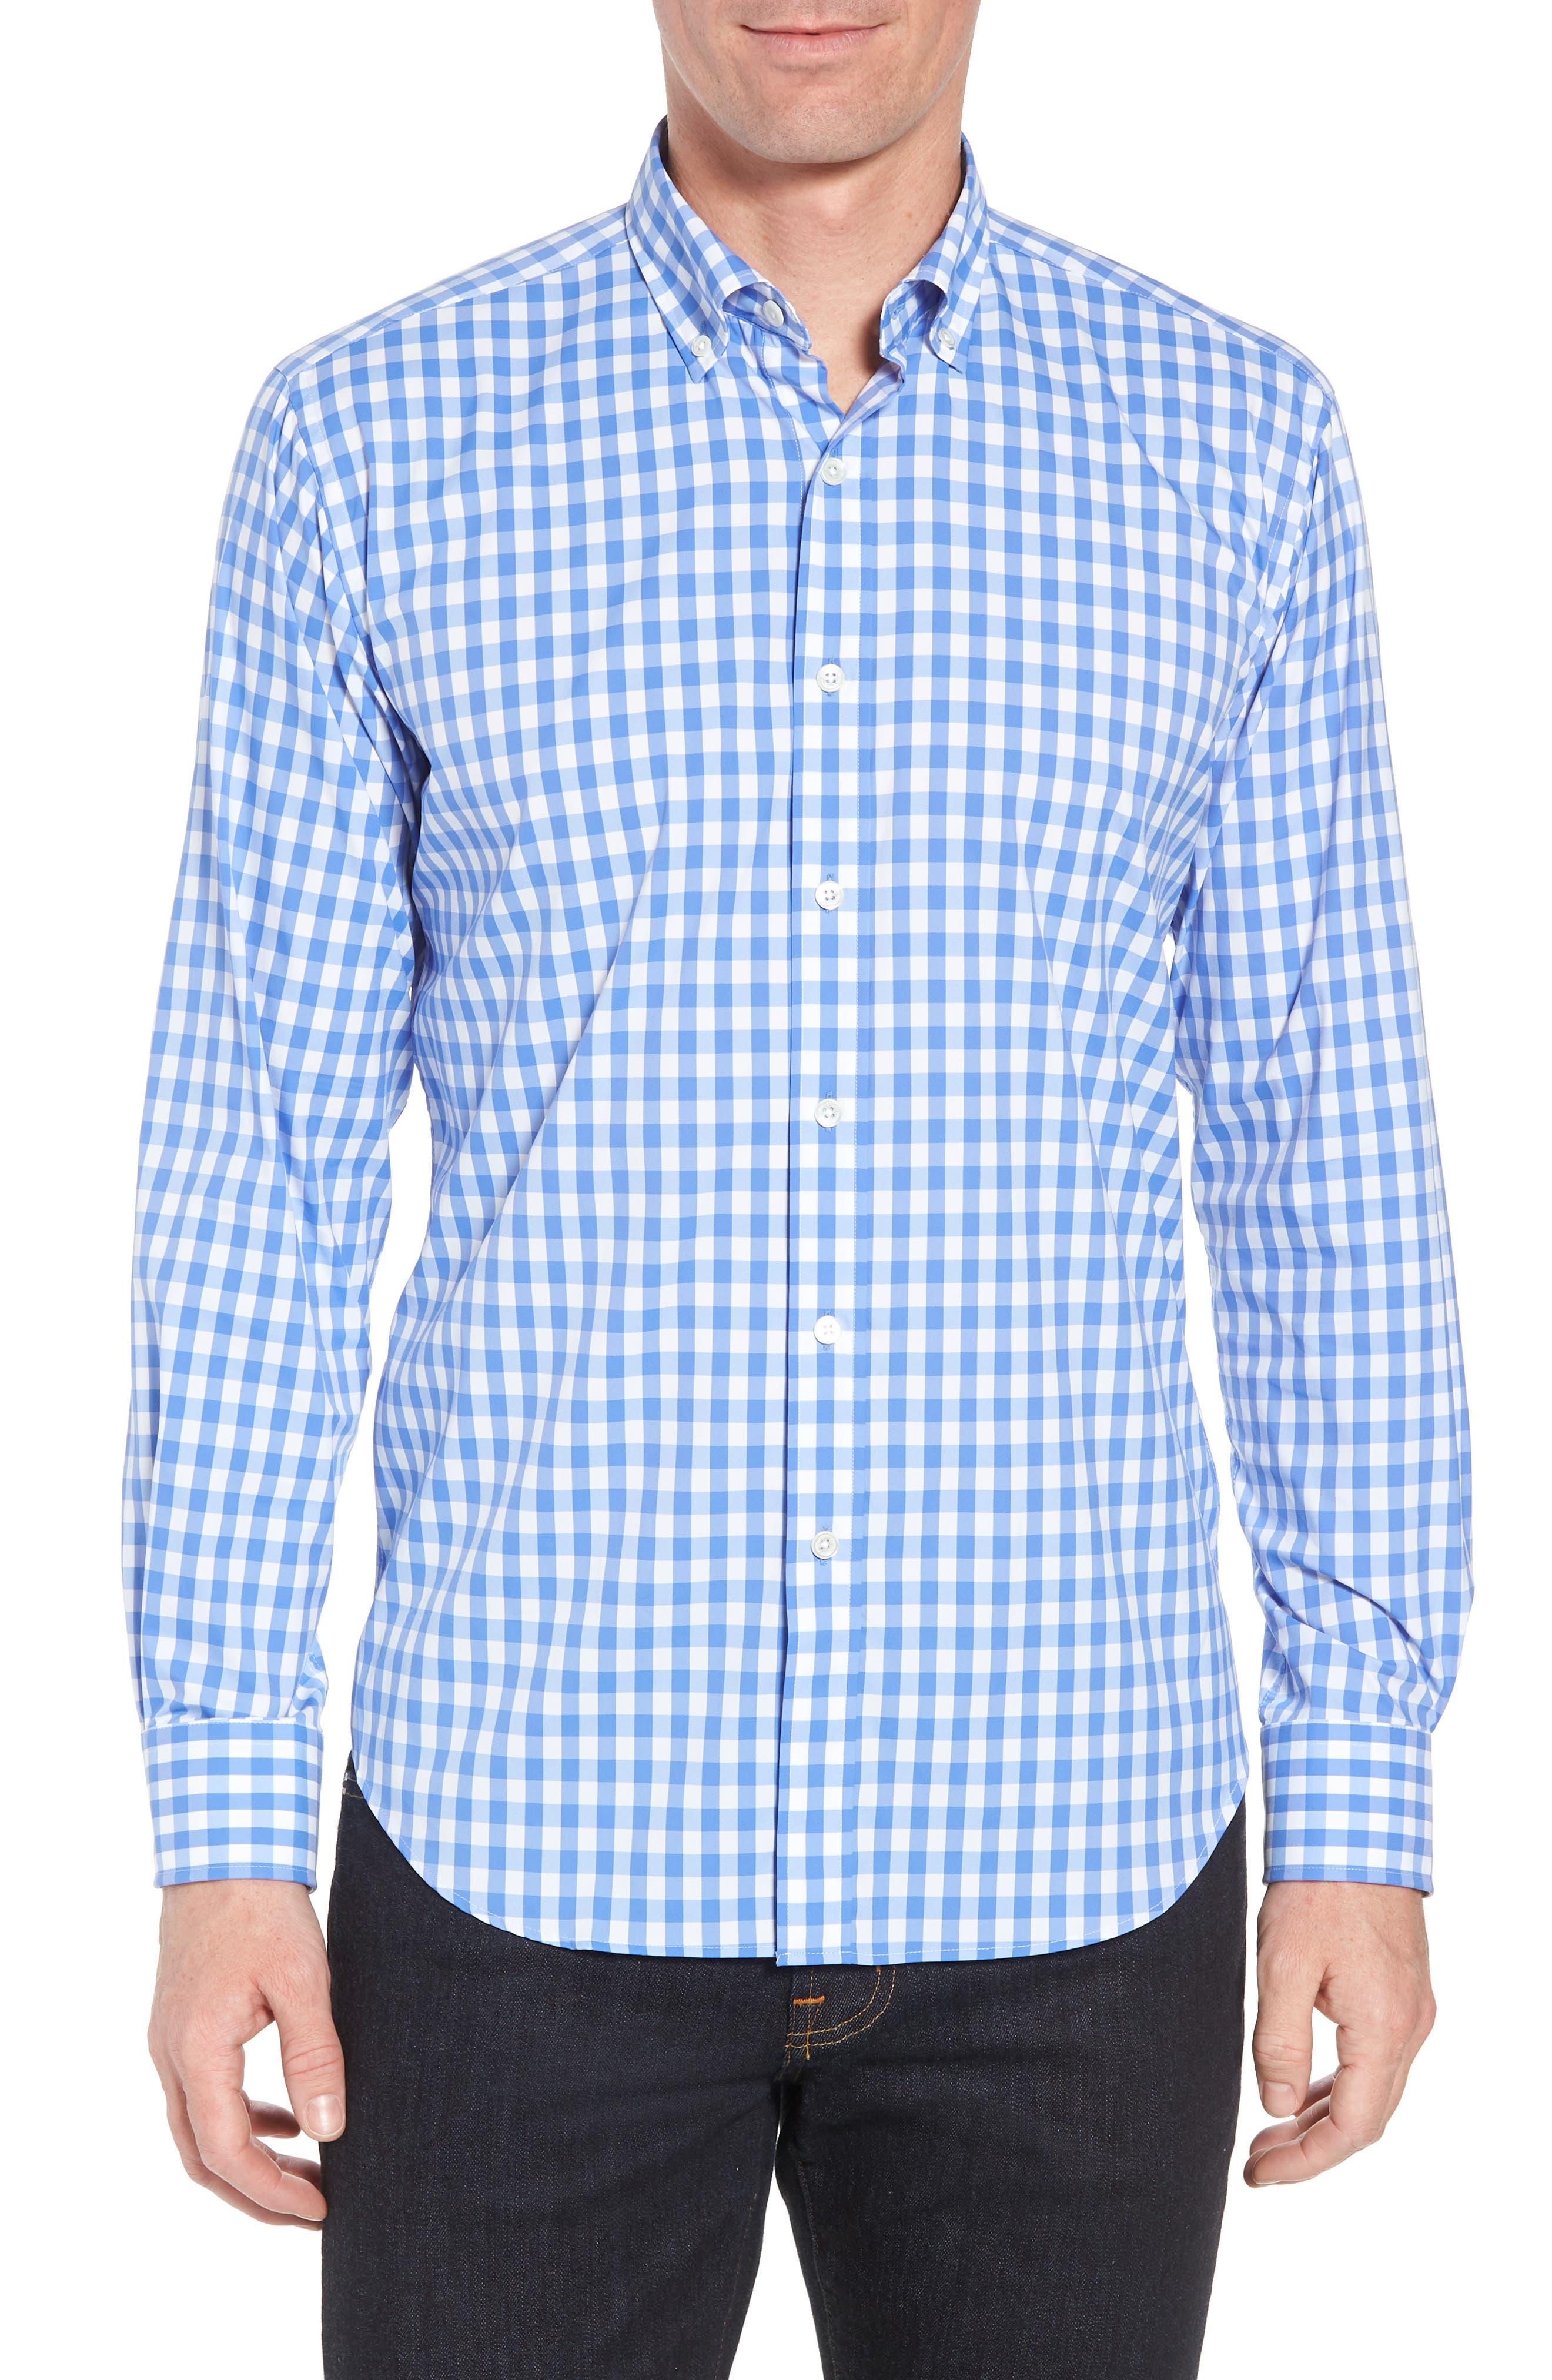 BUGATCHI Shaped Fit Gingham Sport Shirt, Main, color, 422